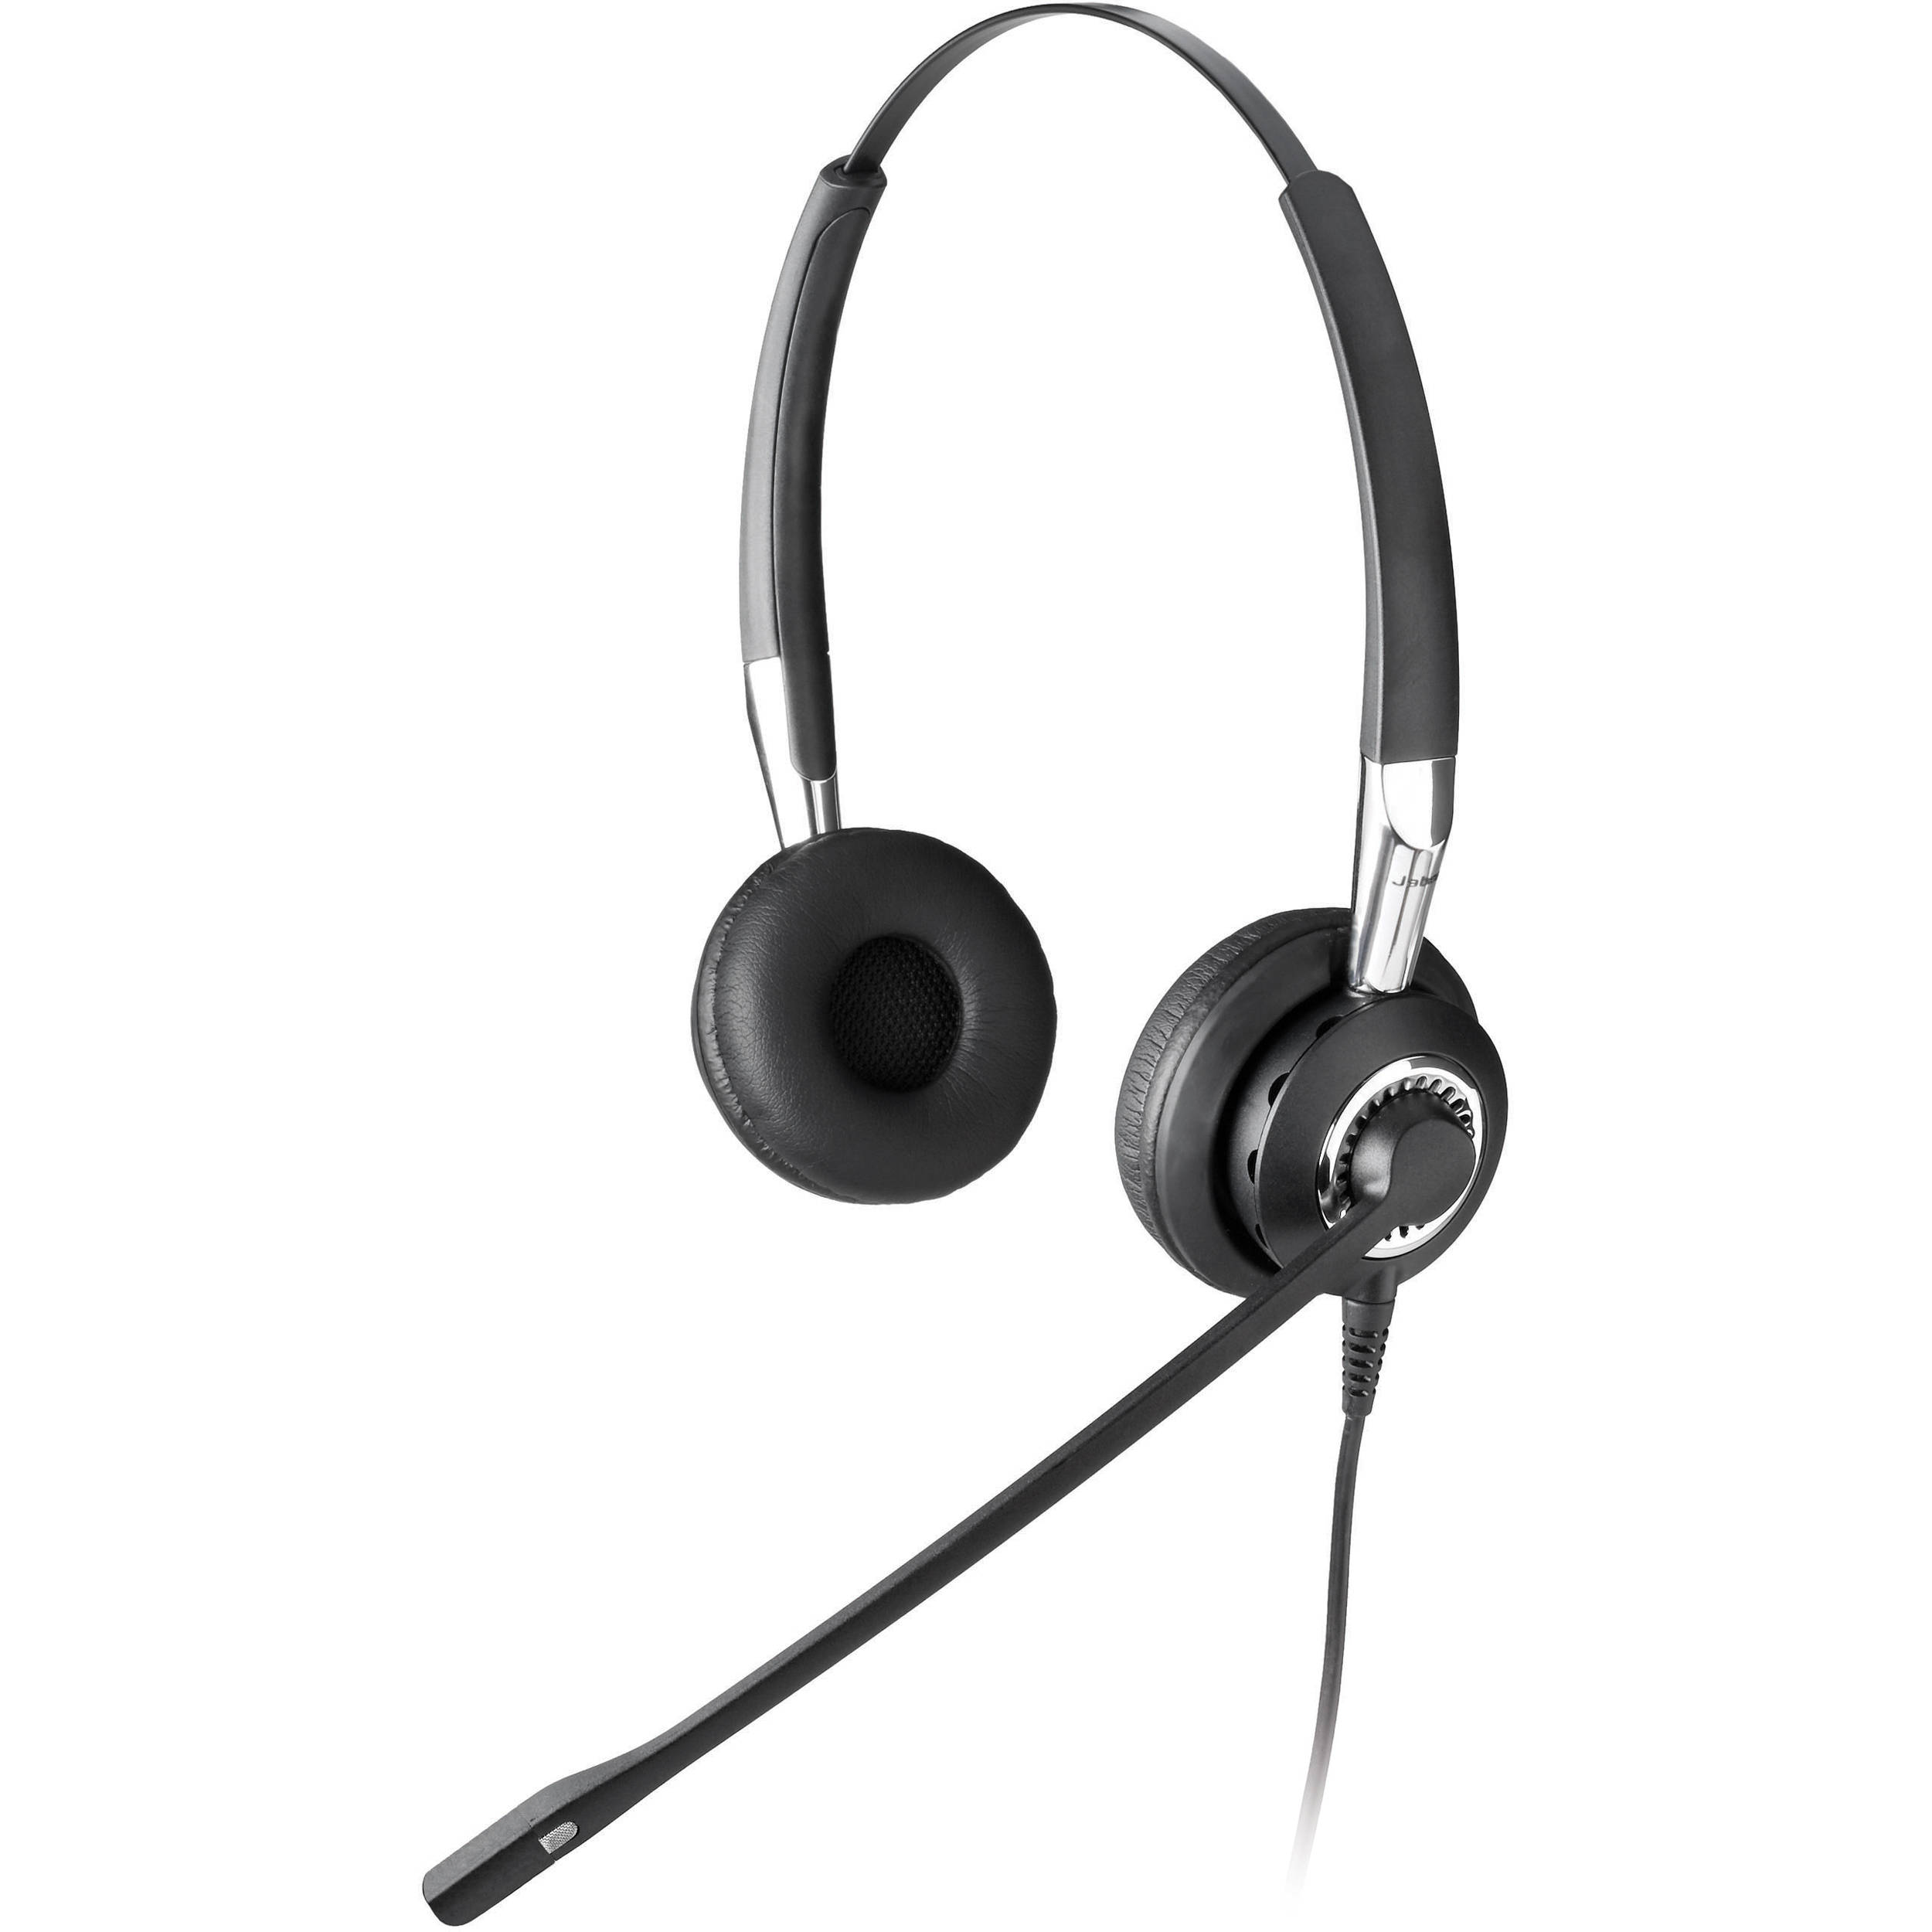 Wired Headset Jabra Biz 2400 Duo Wb Balance: Jabra Biz 2400 Duo / Noise Canceling Headset 2409-820-105 B&H